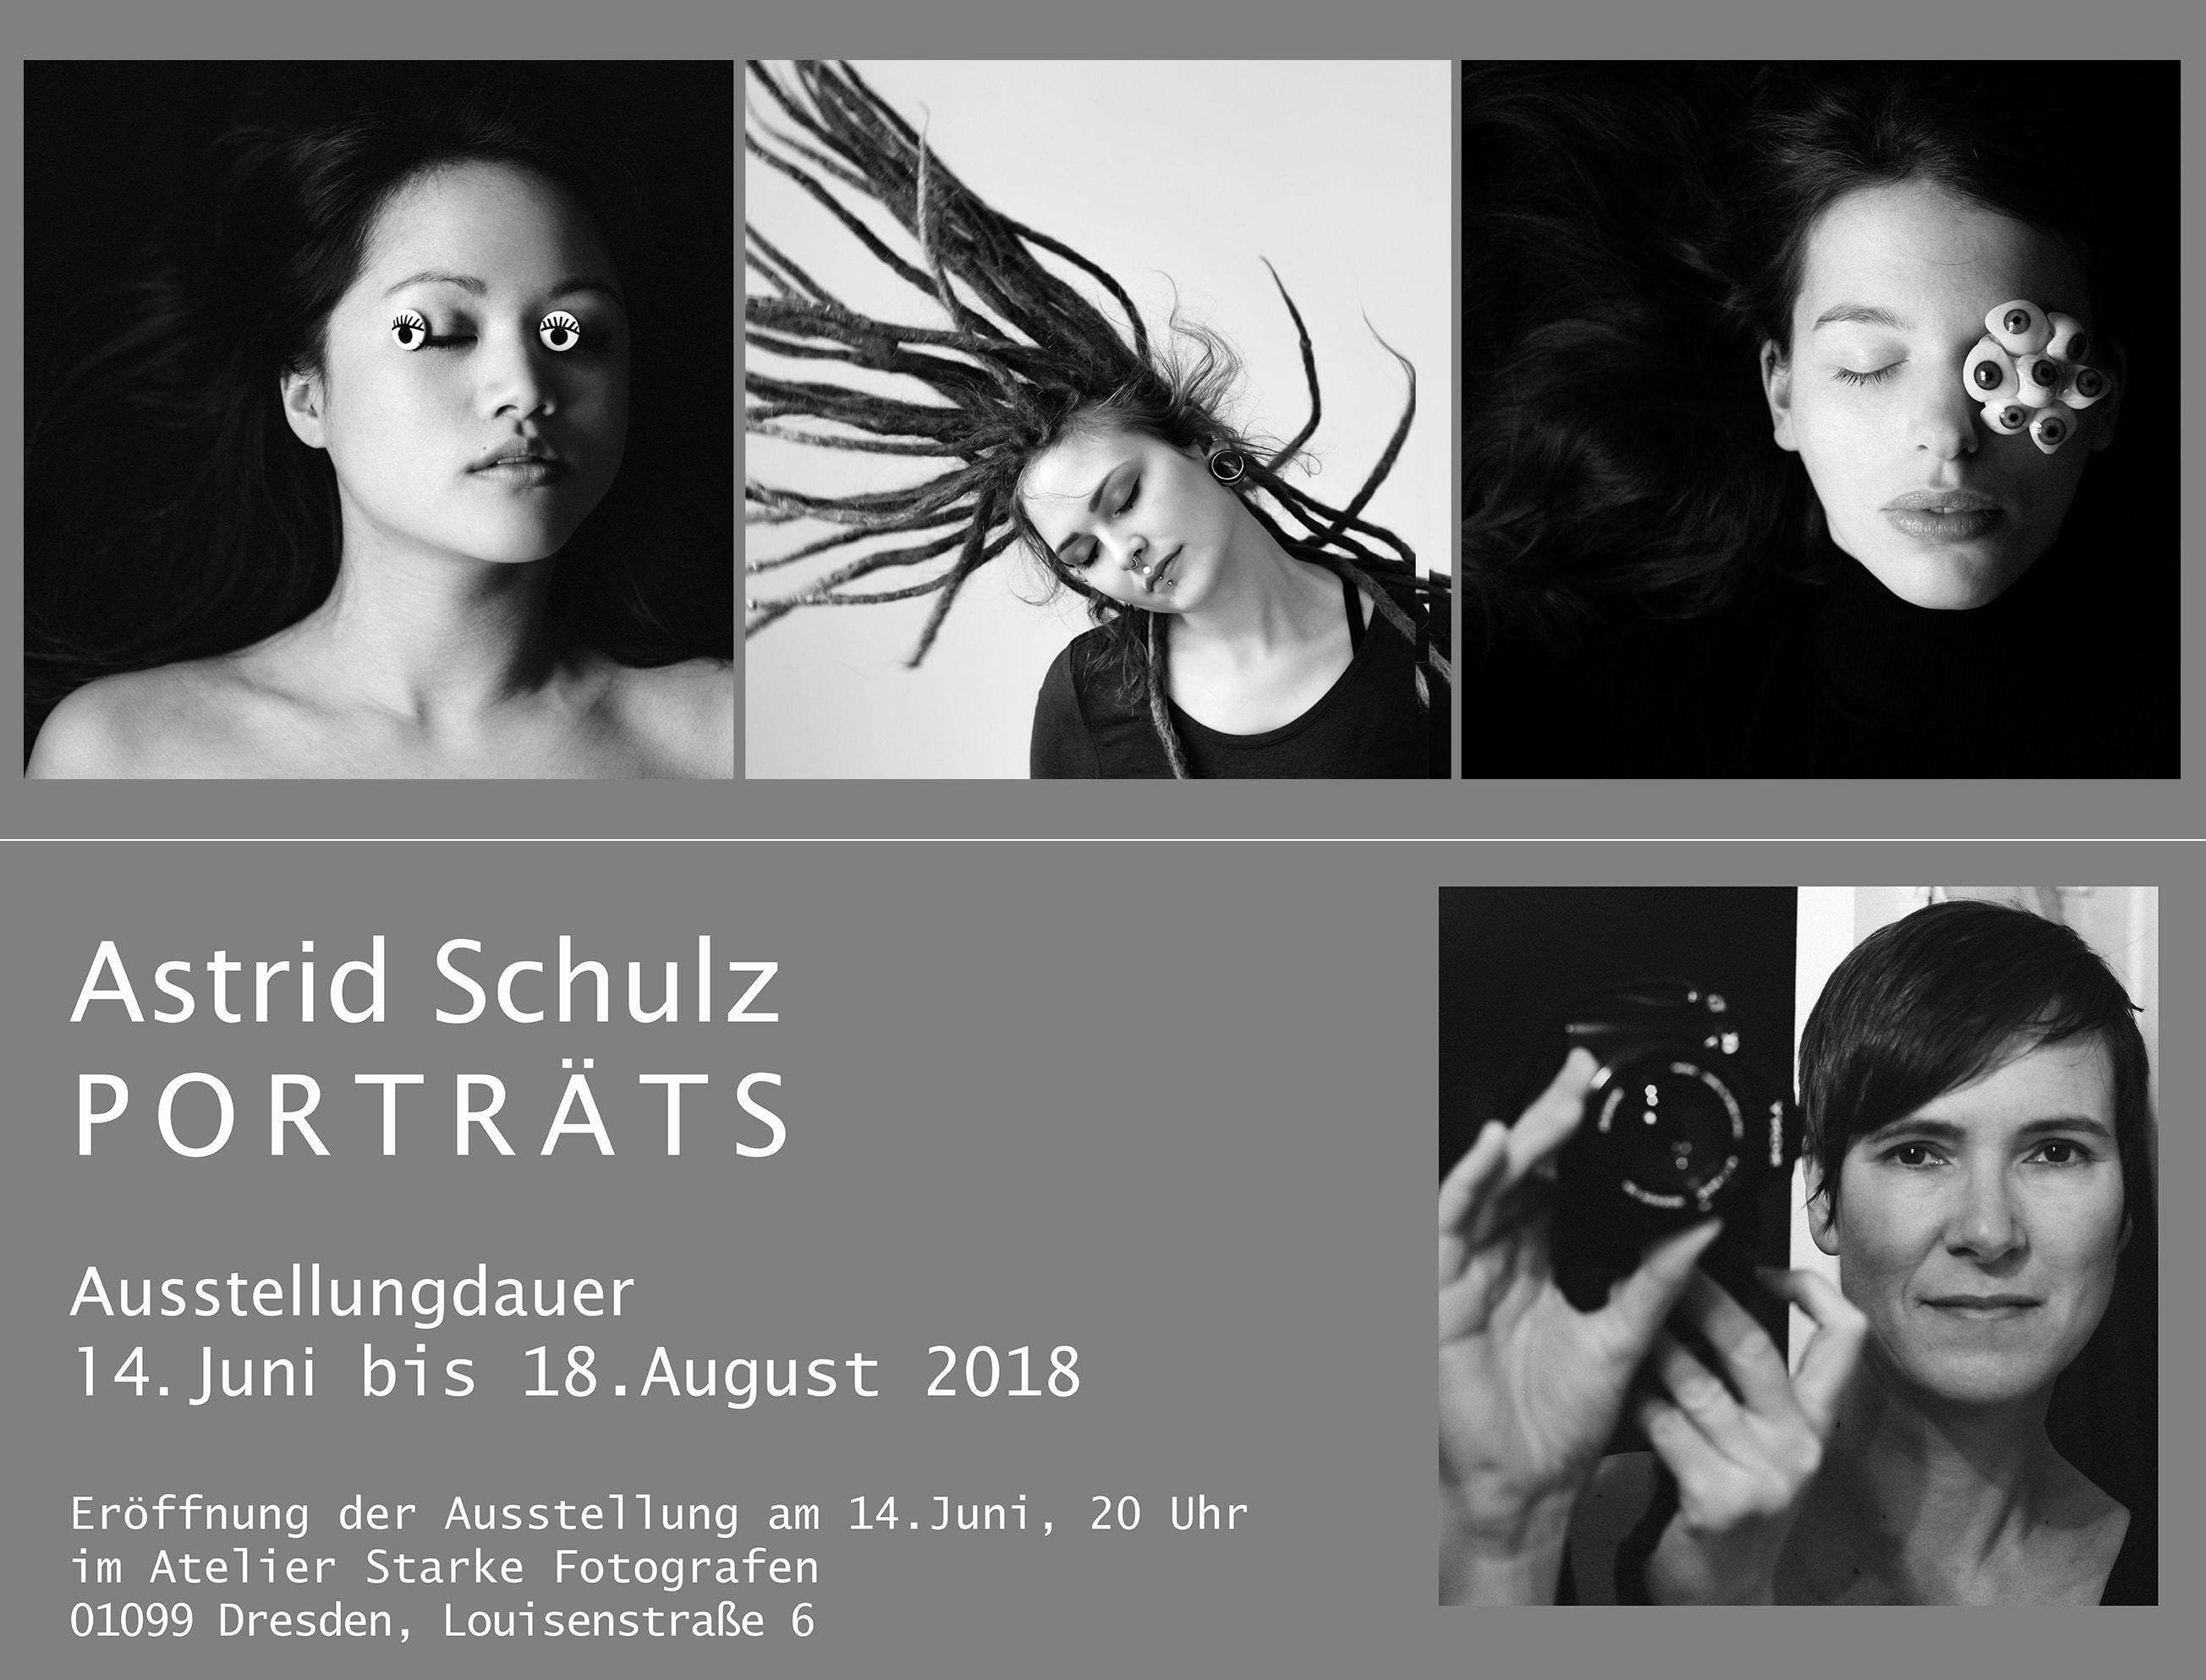 Fotograf Bremen astrid schulz fotografie menschenfotografie fotografin astrid